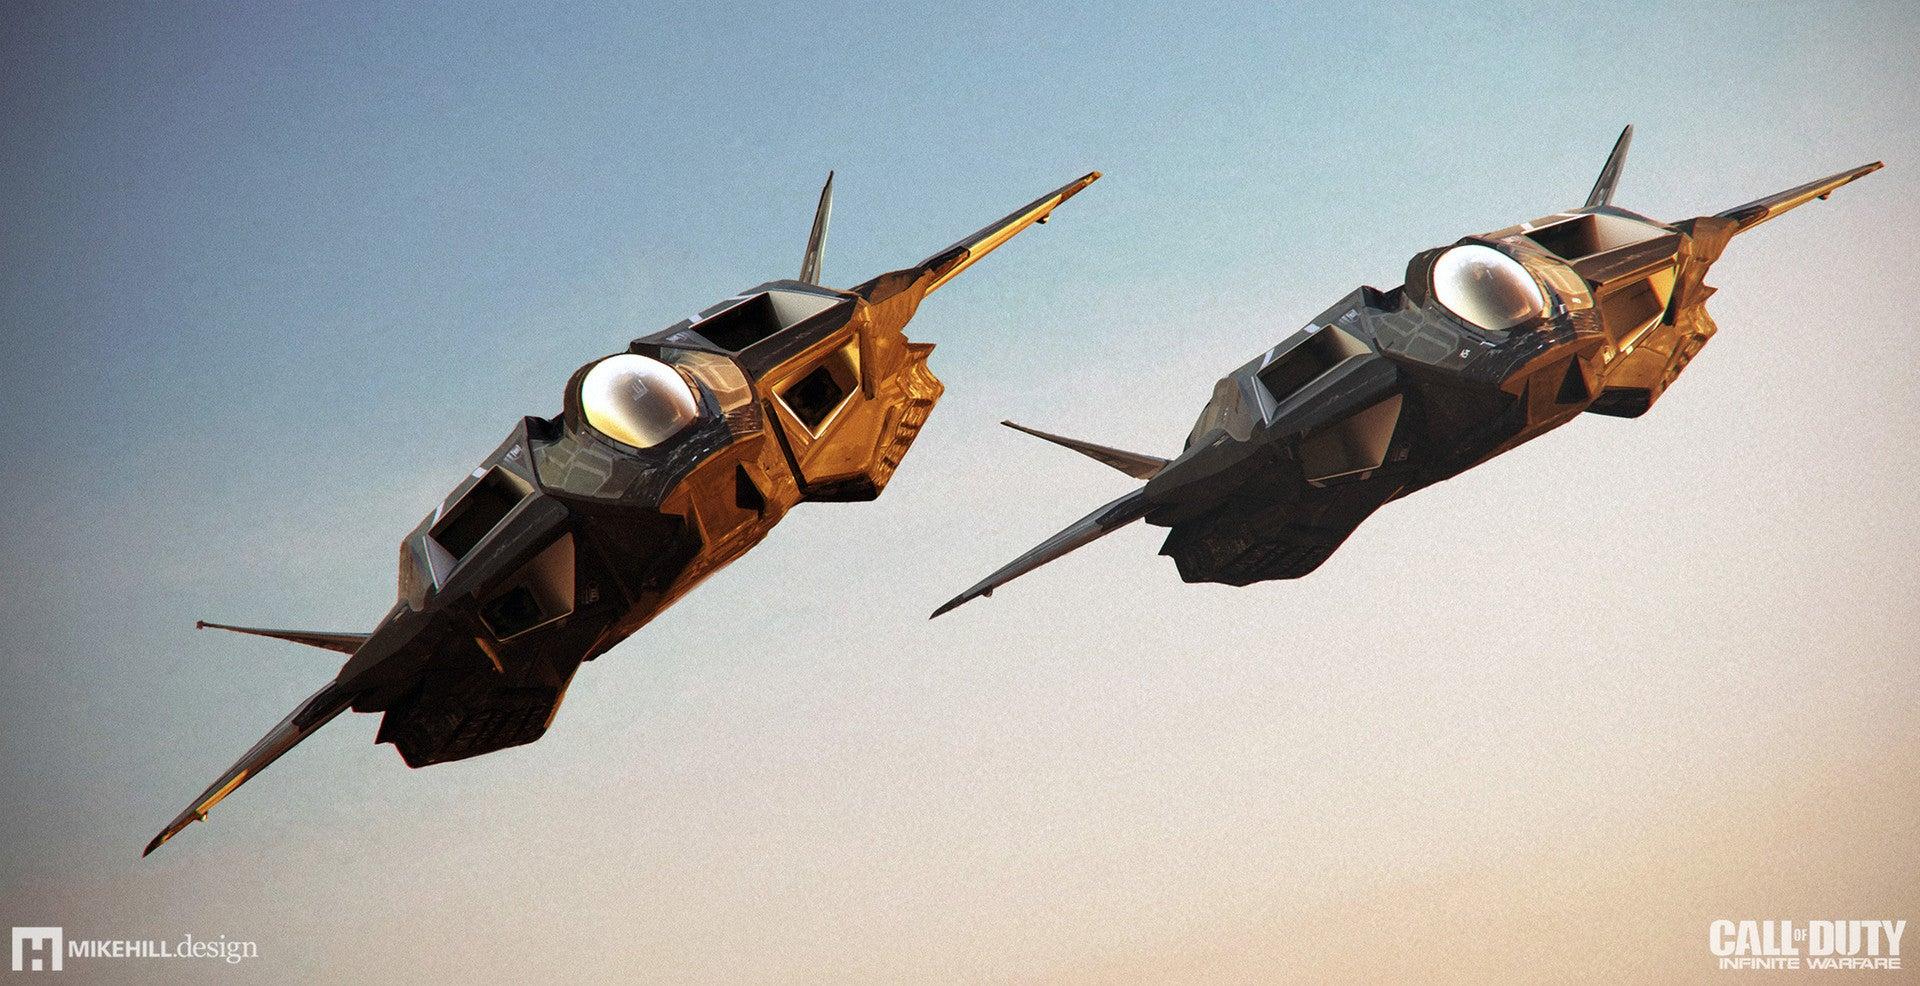 fine art infinite warfare has some very cool spaceships